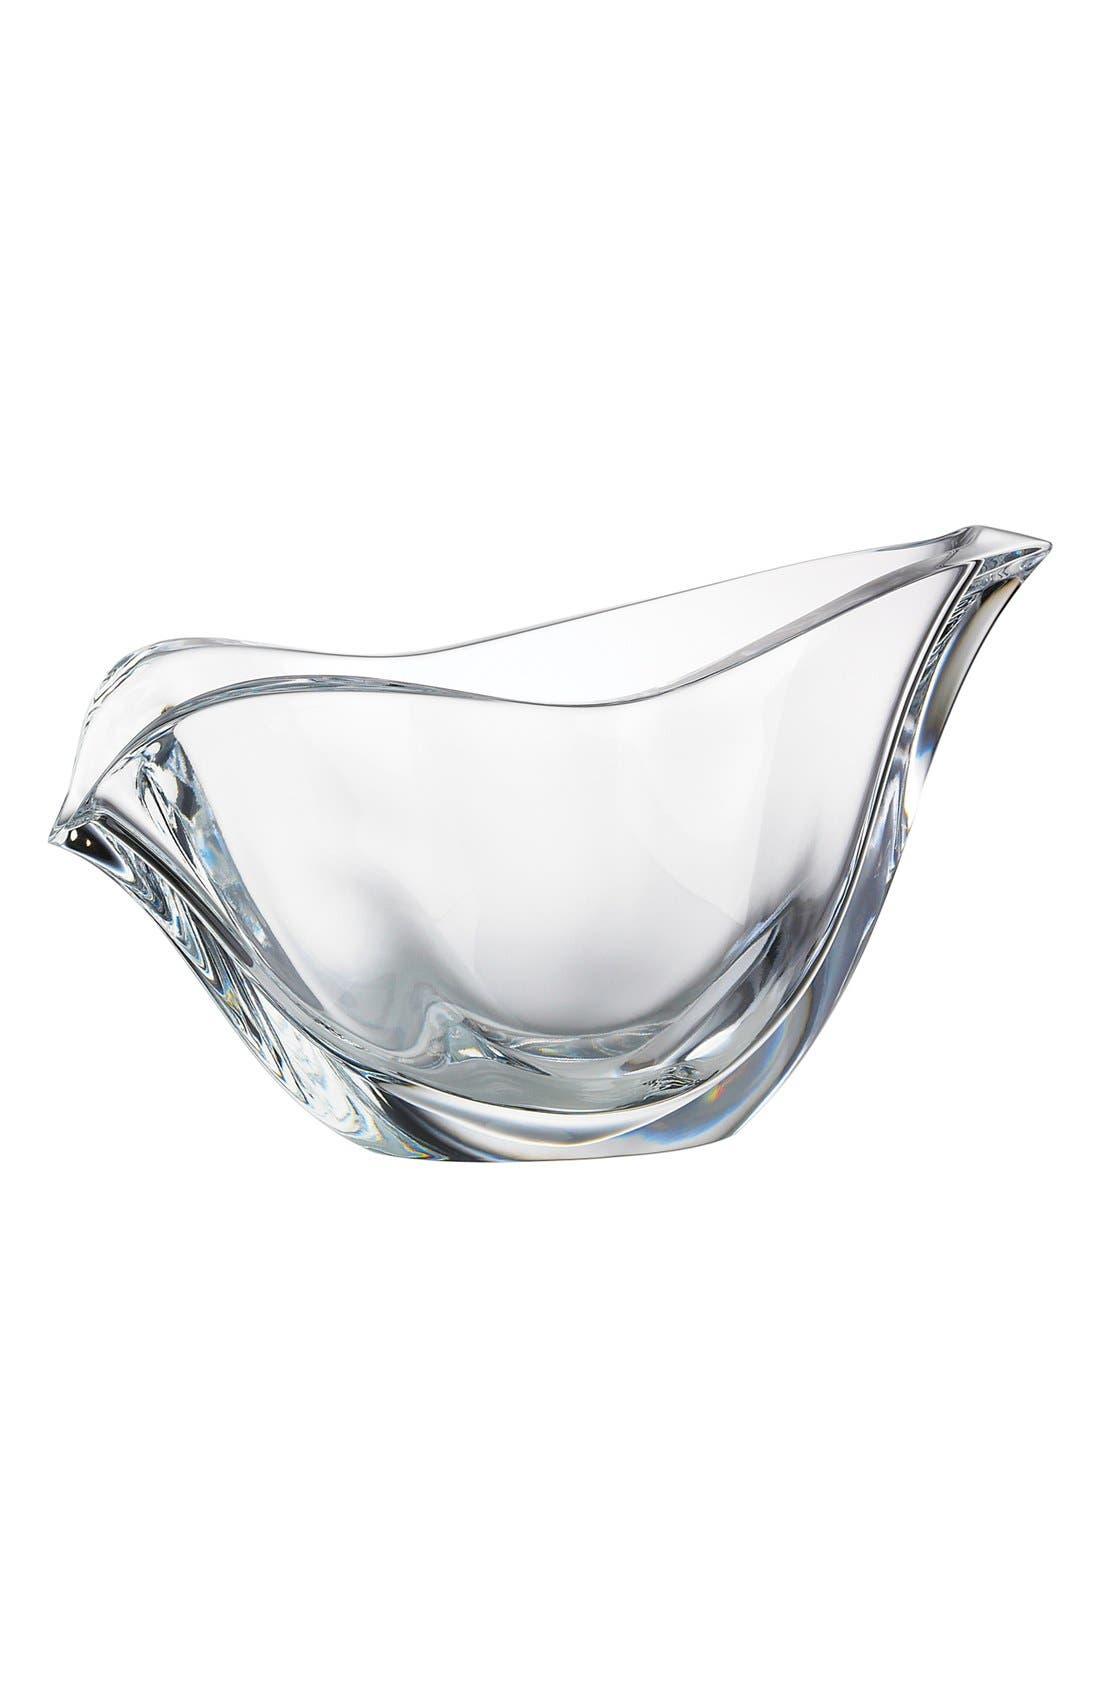 Main Image - Nambé 'Lovebirds' Bowl, Large